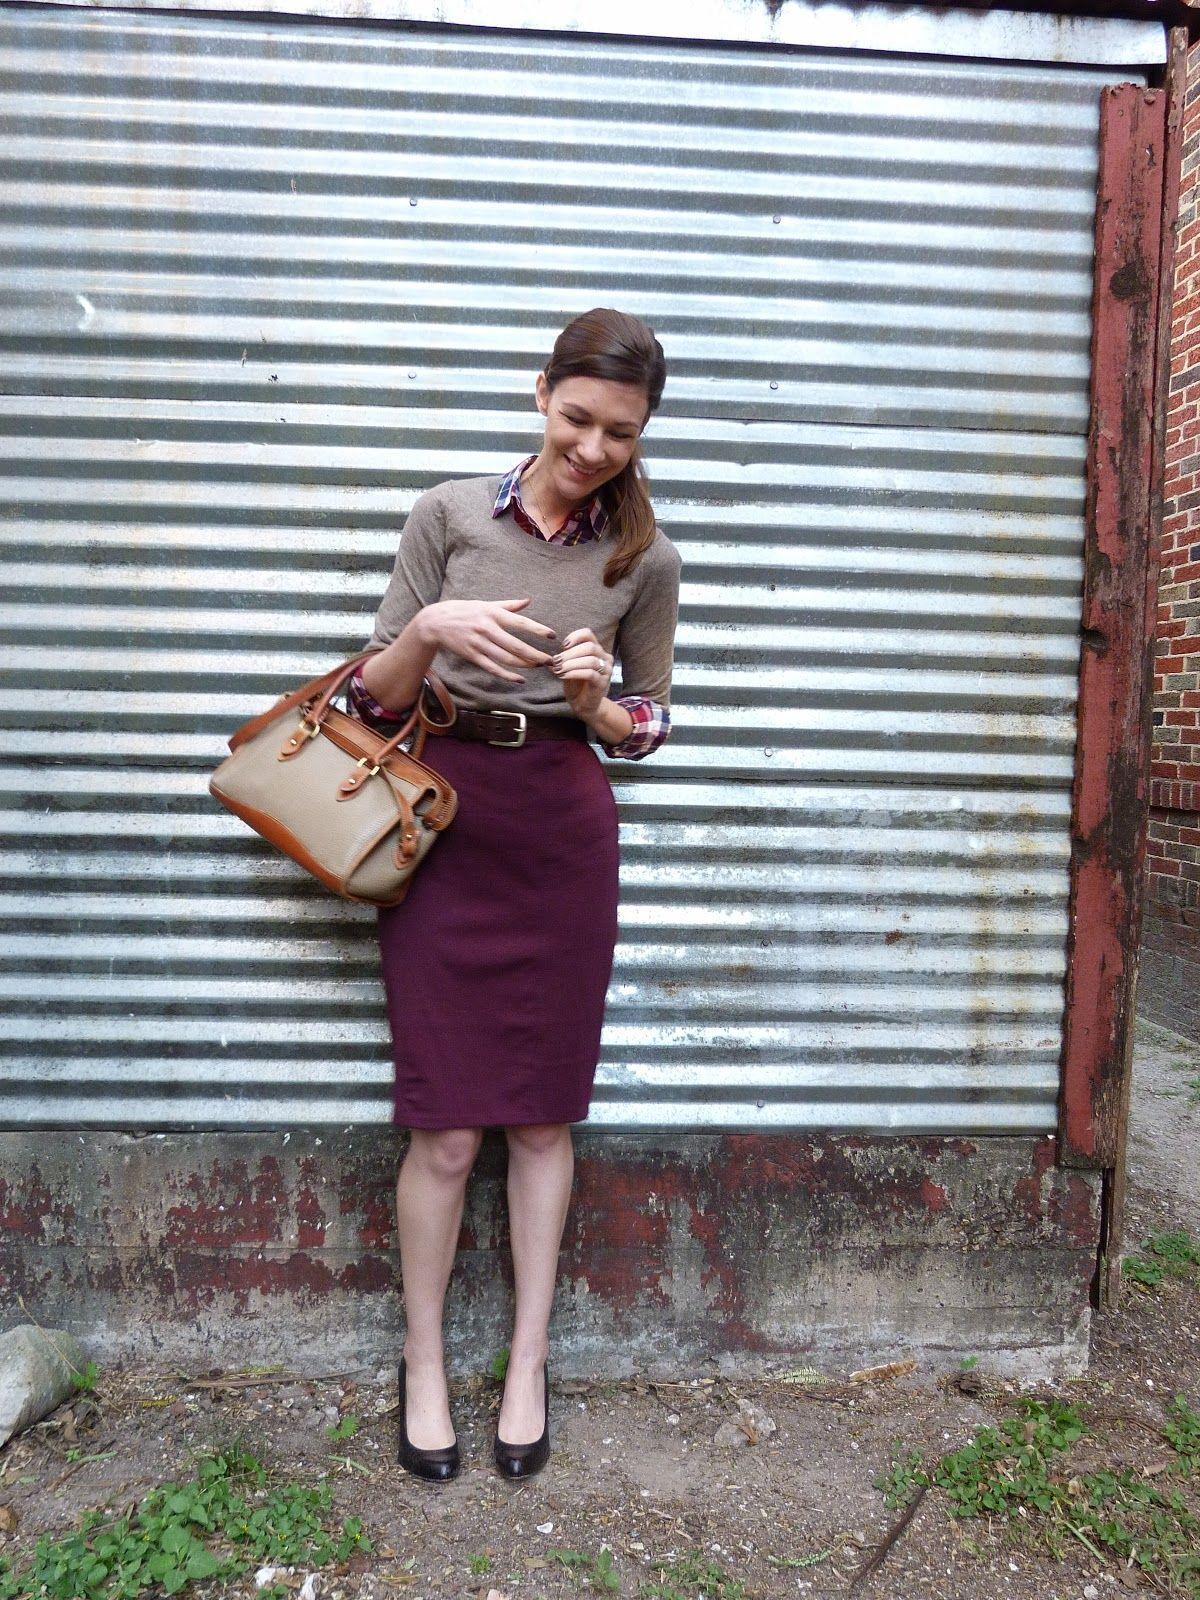 Maroon pencil skirt, plaid button-down shirt, tan sweater tucked ...